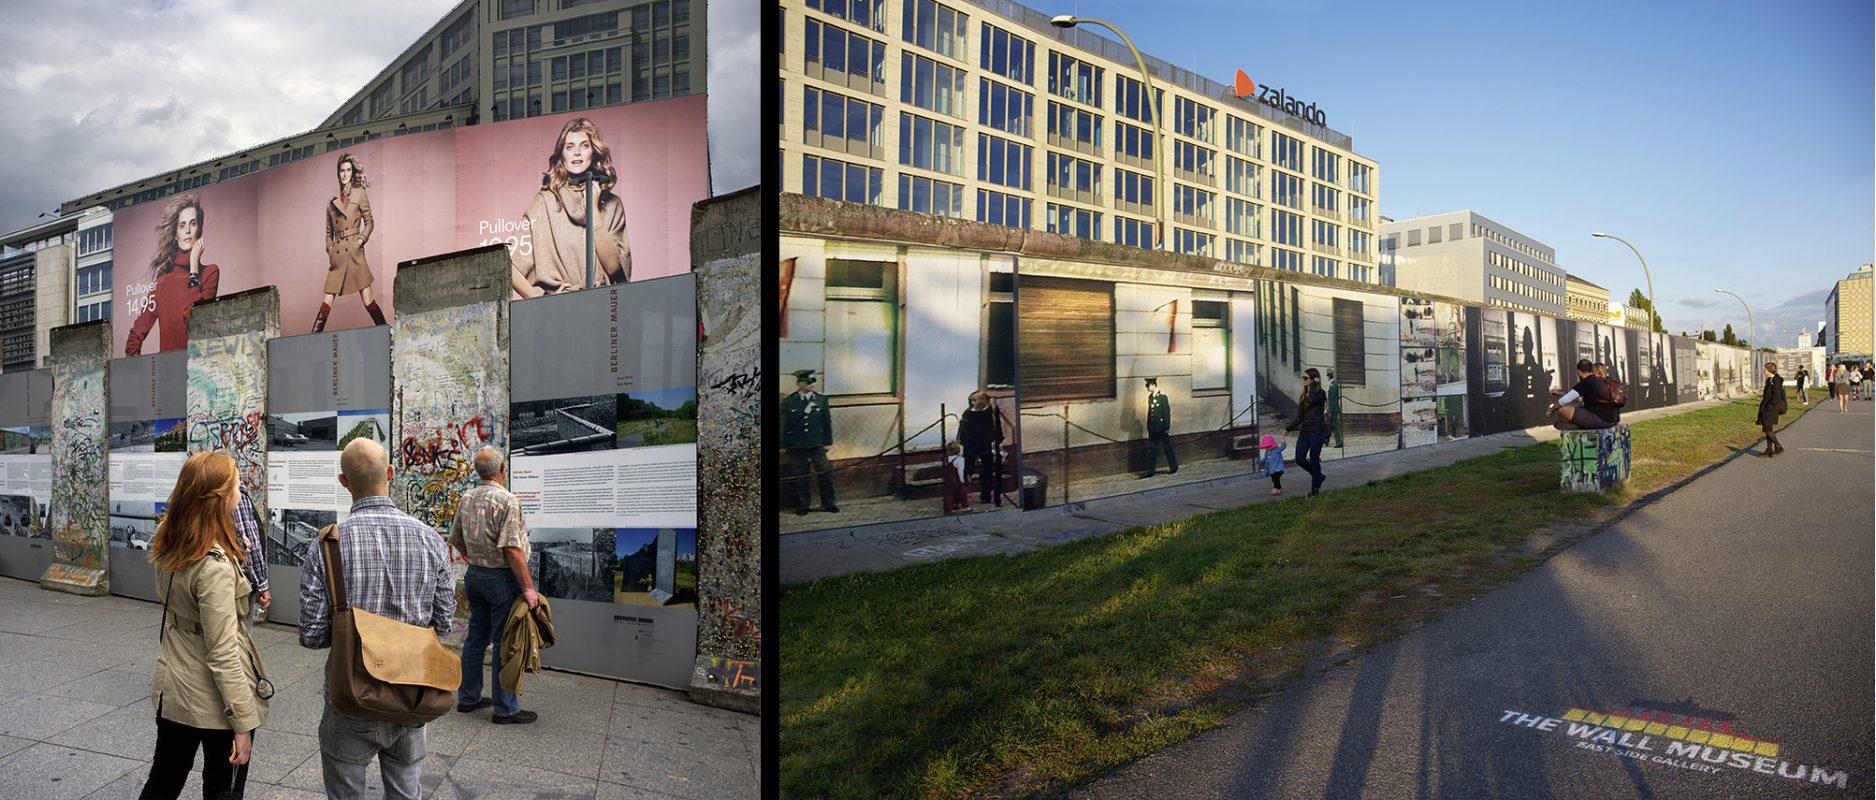 Potsdamer Platz Mauerstück, East Side Gallery Zalando